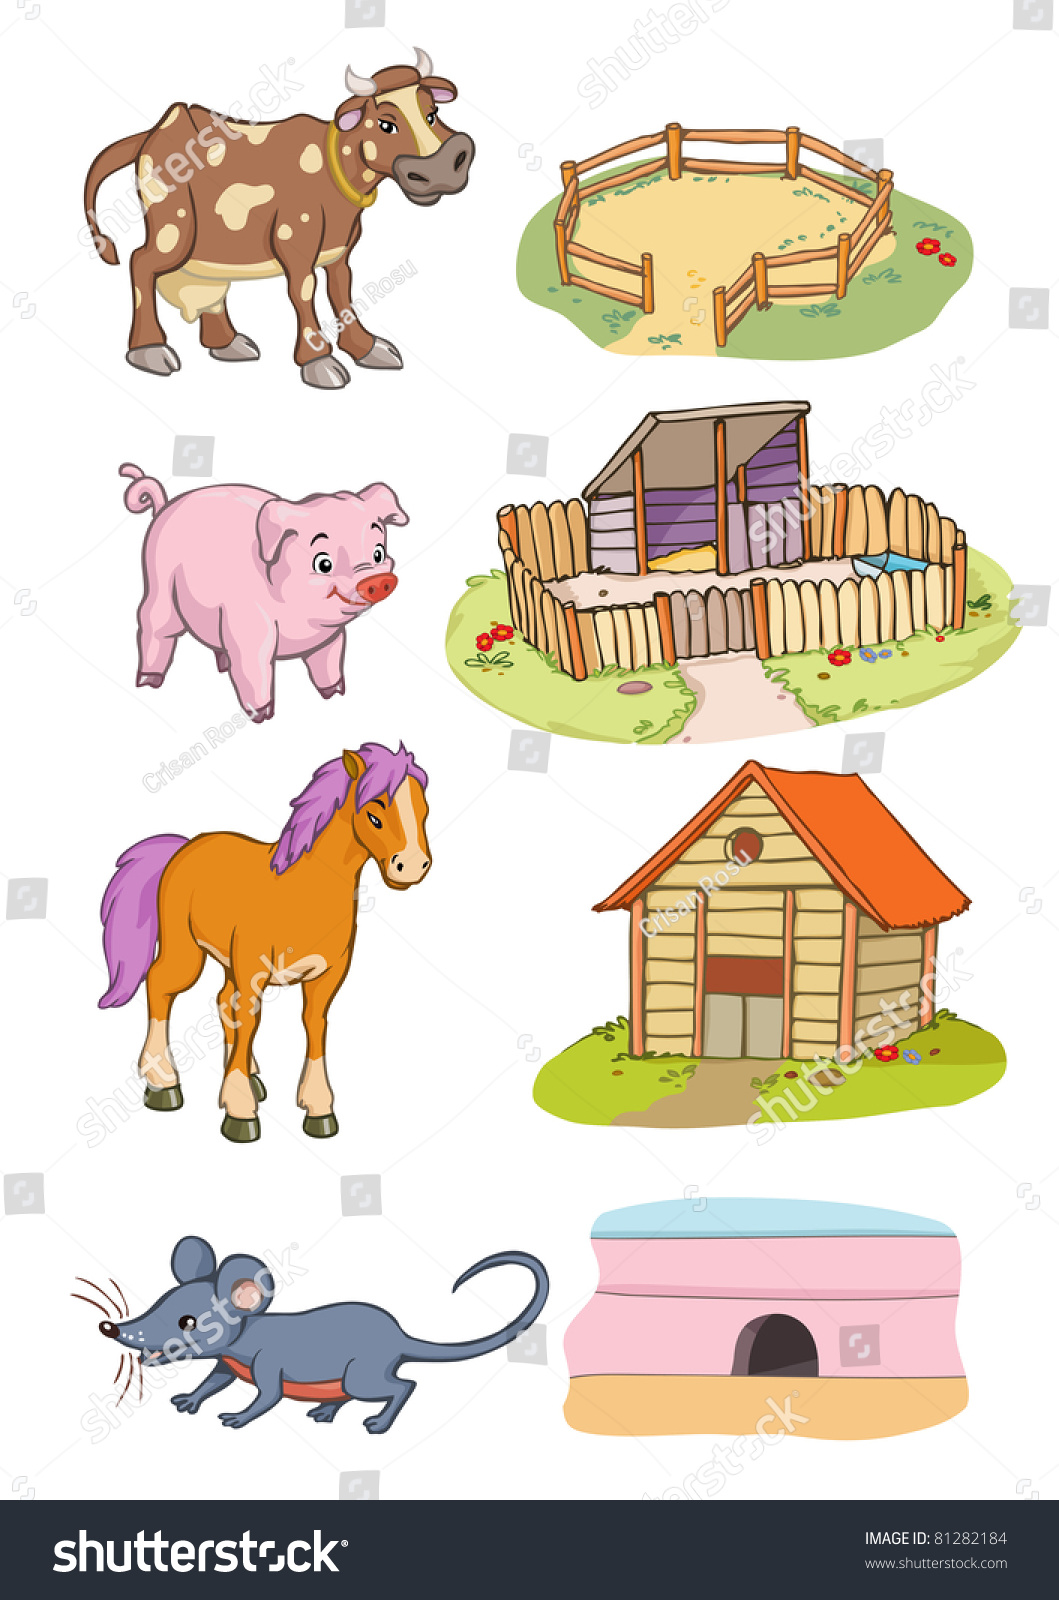 Vector Illustration Animals Habitat Cartoon Concept Vector de ...